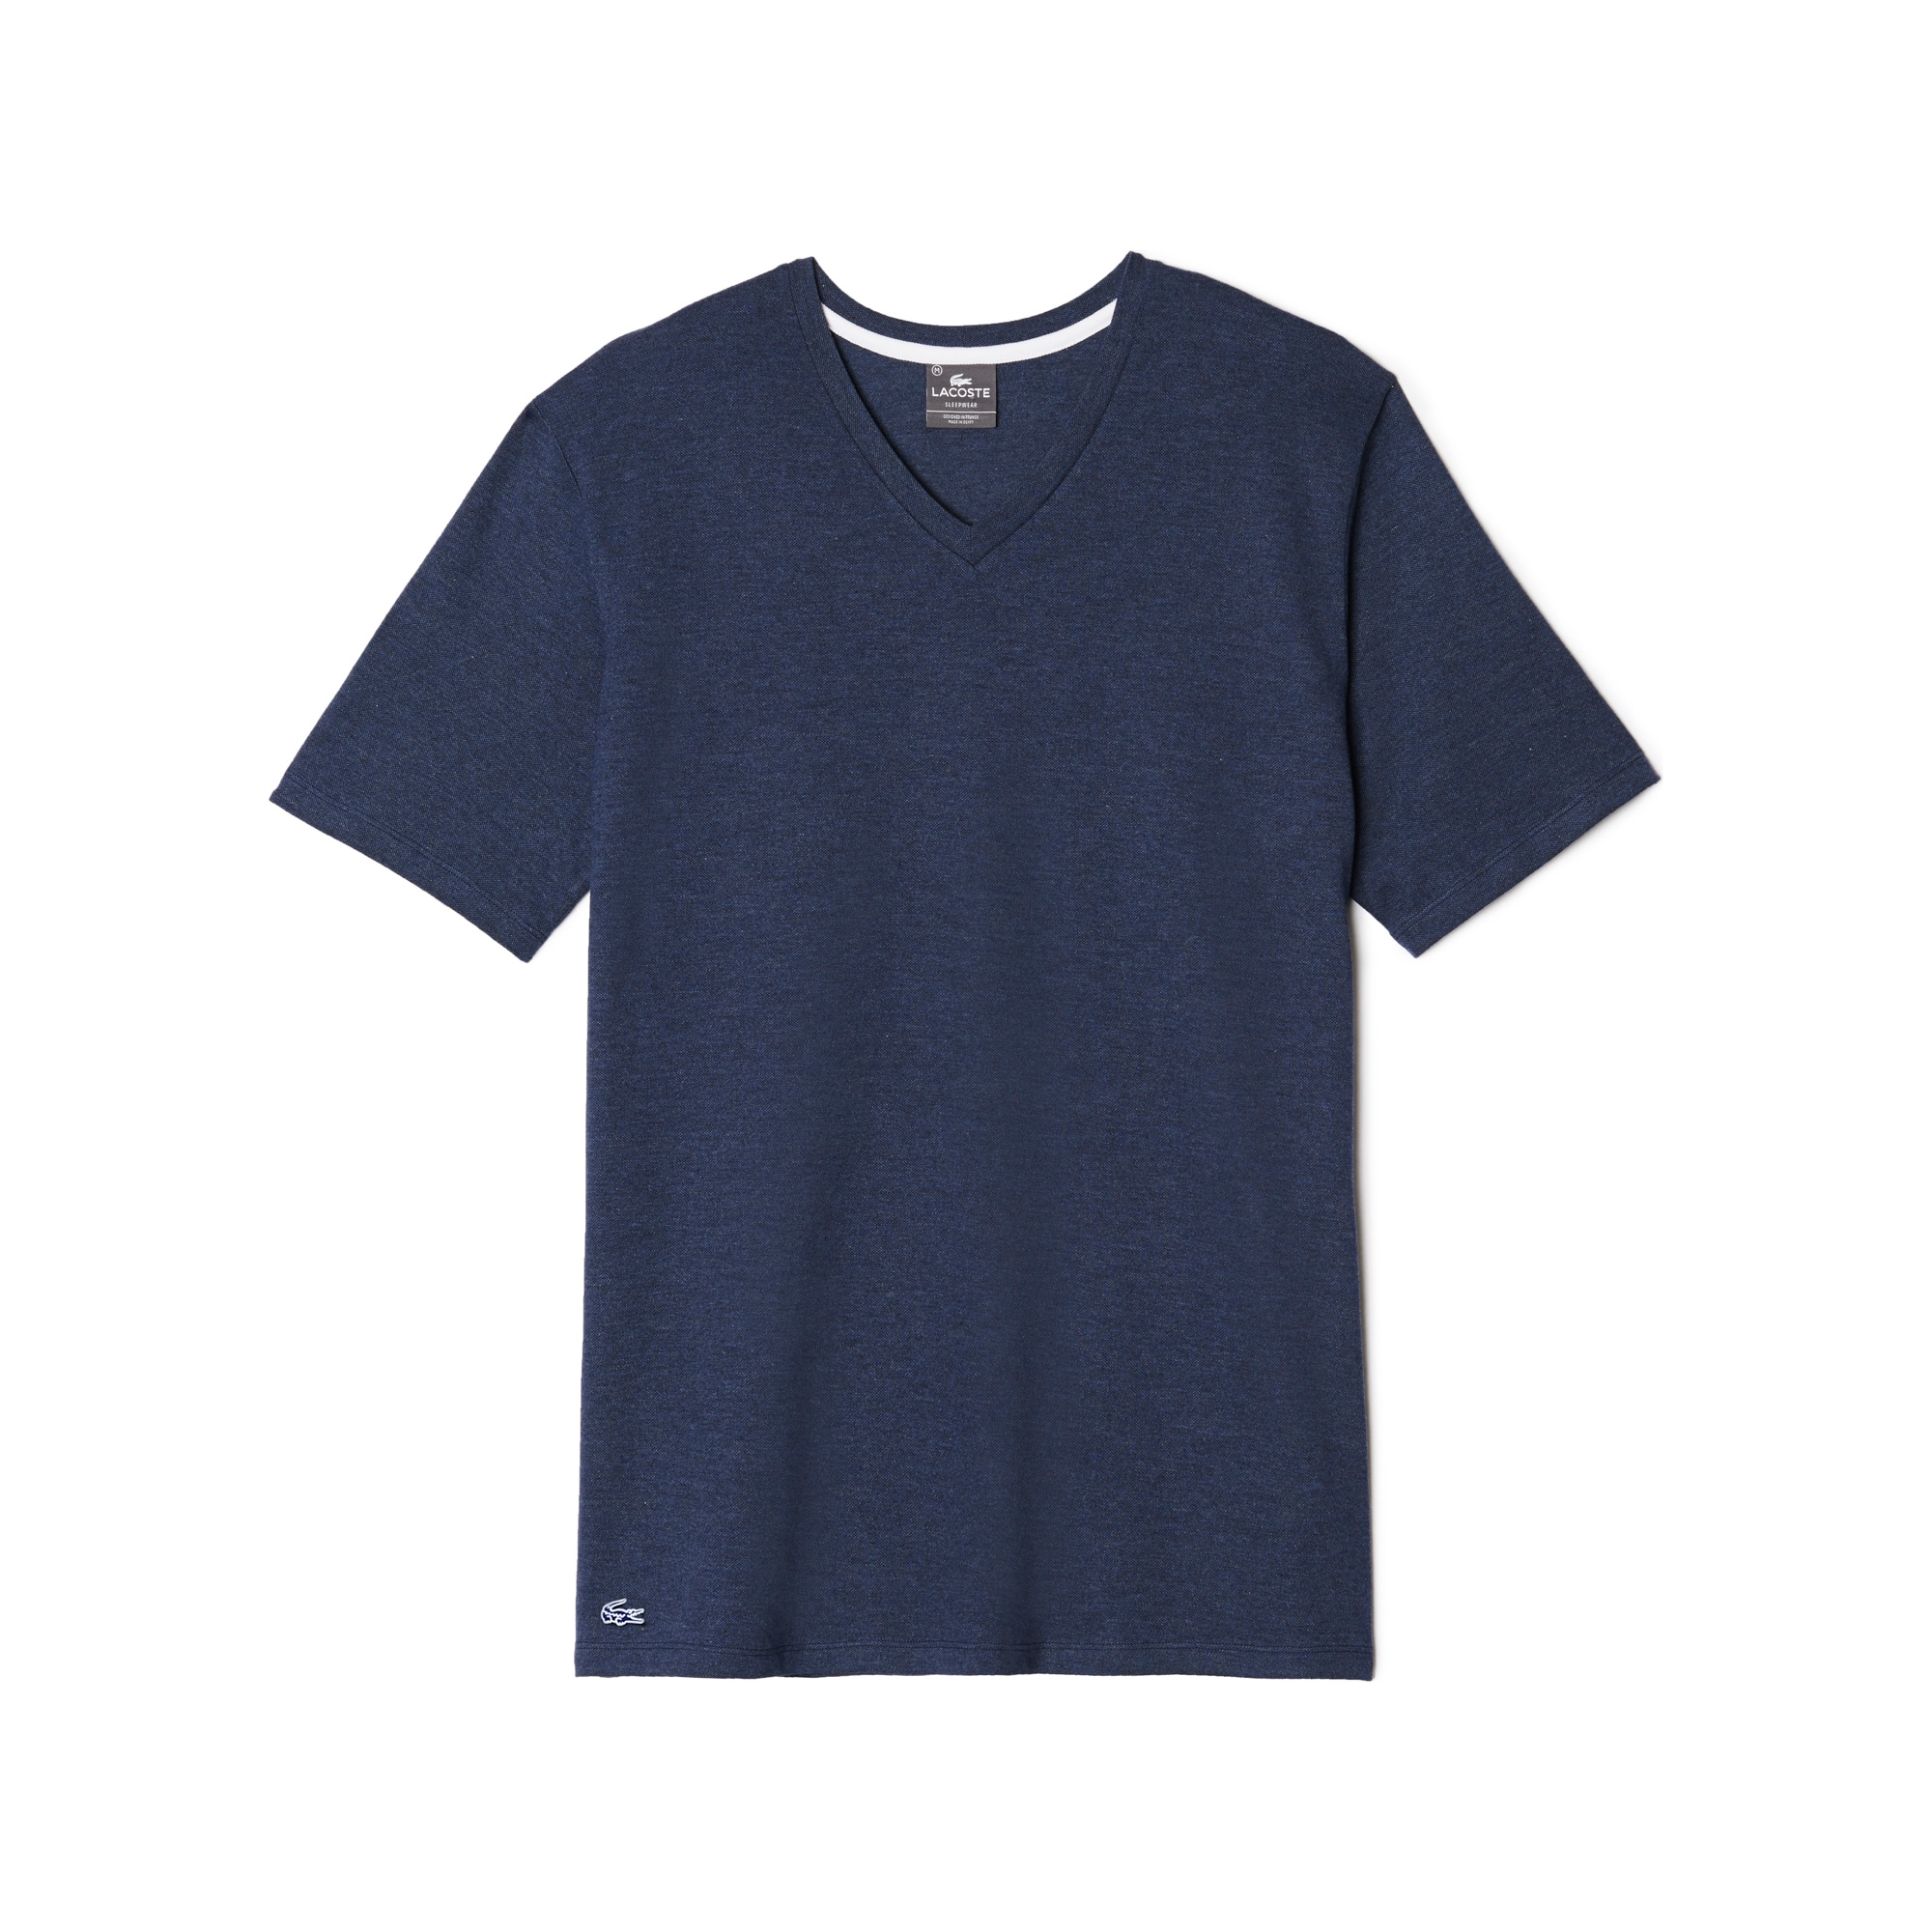 L.12.12 T-shirt